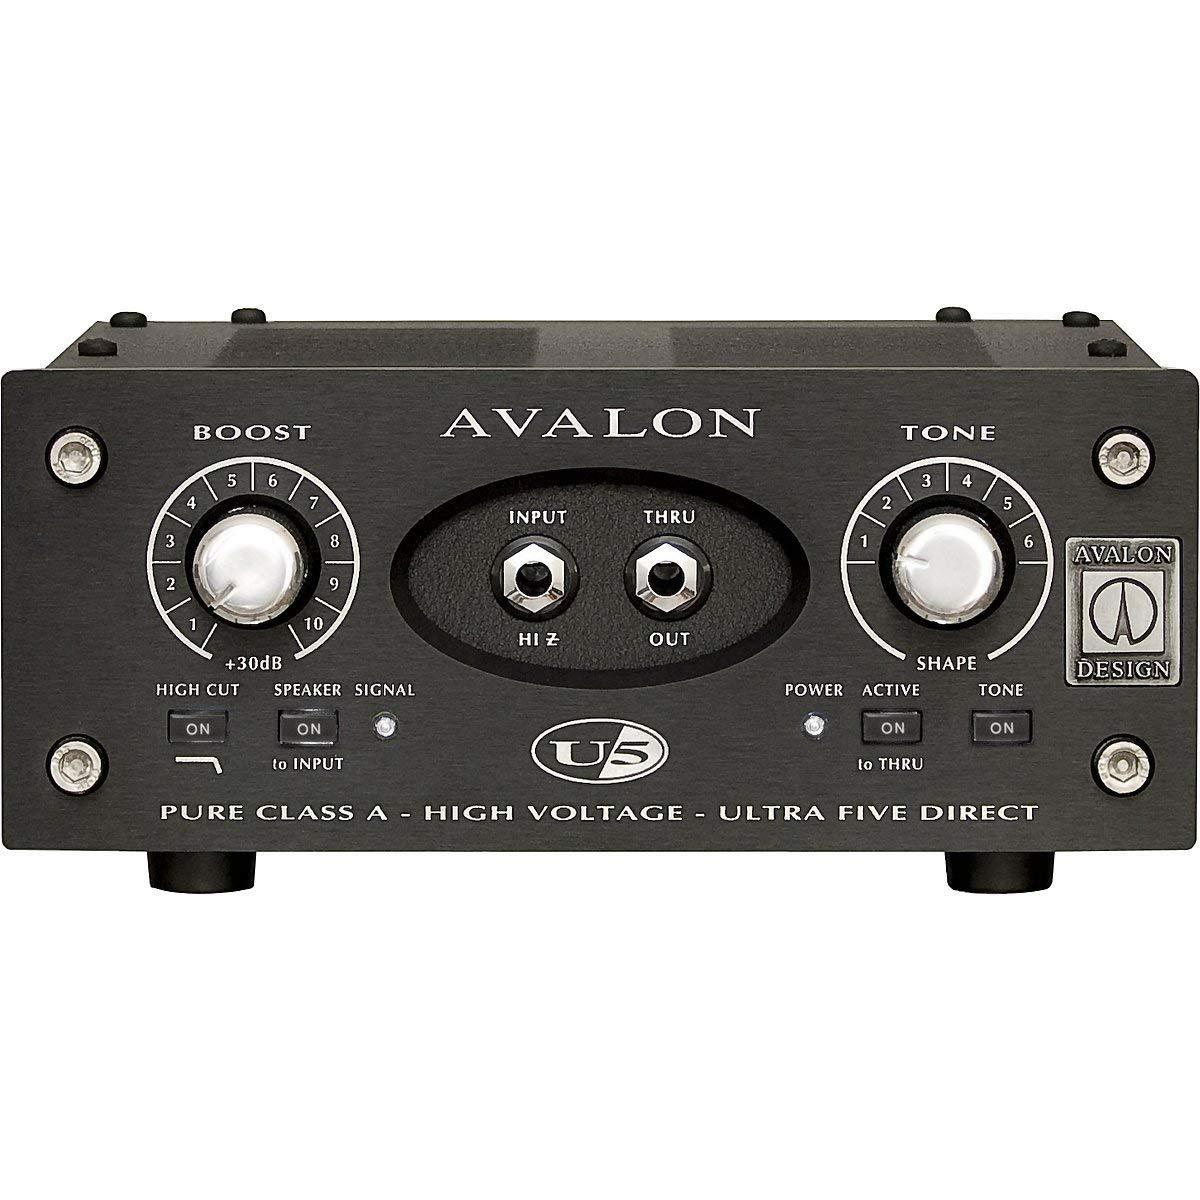 Avalon U5 15th Anniversary Edition Direct Box (Black)